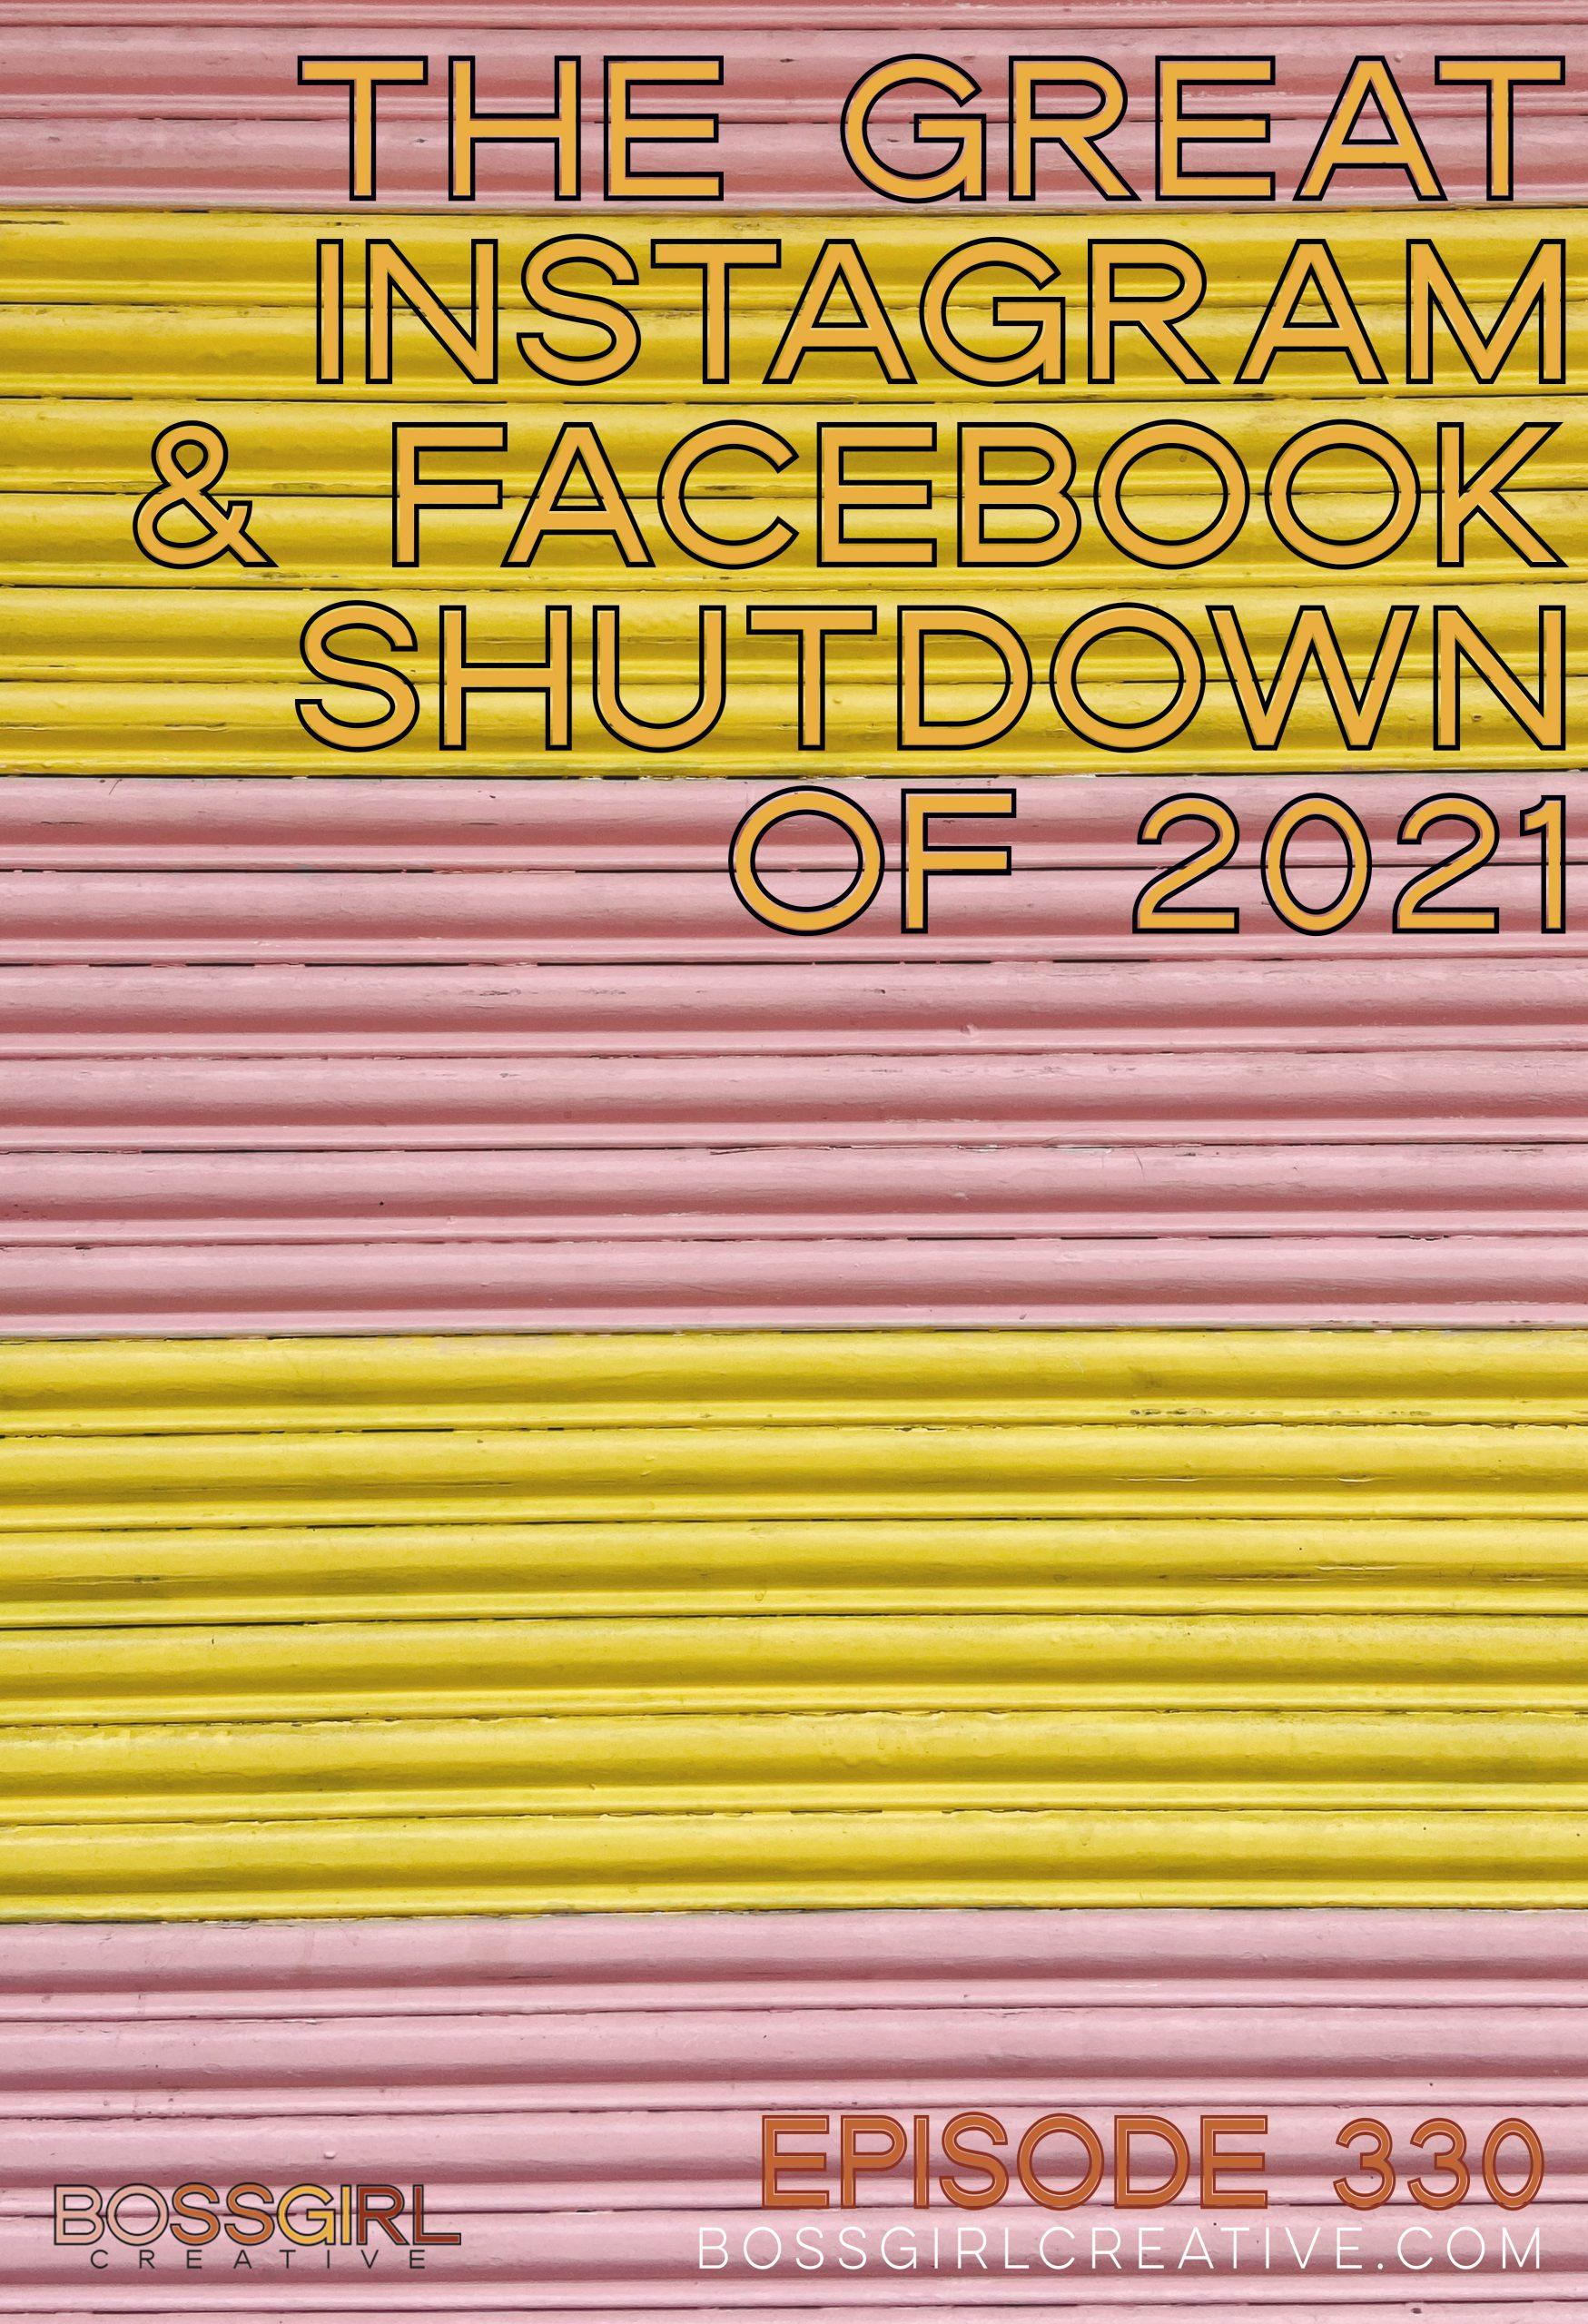 BGC Episode 330 - The Great Instagram & Facebook Shutdown of 2021